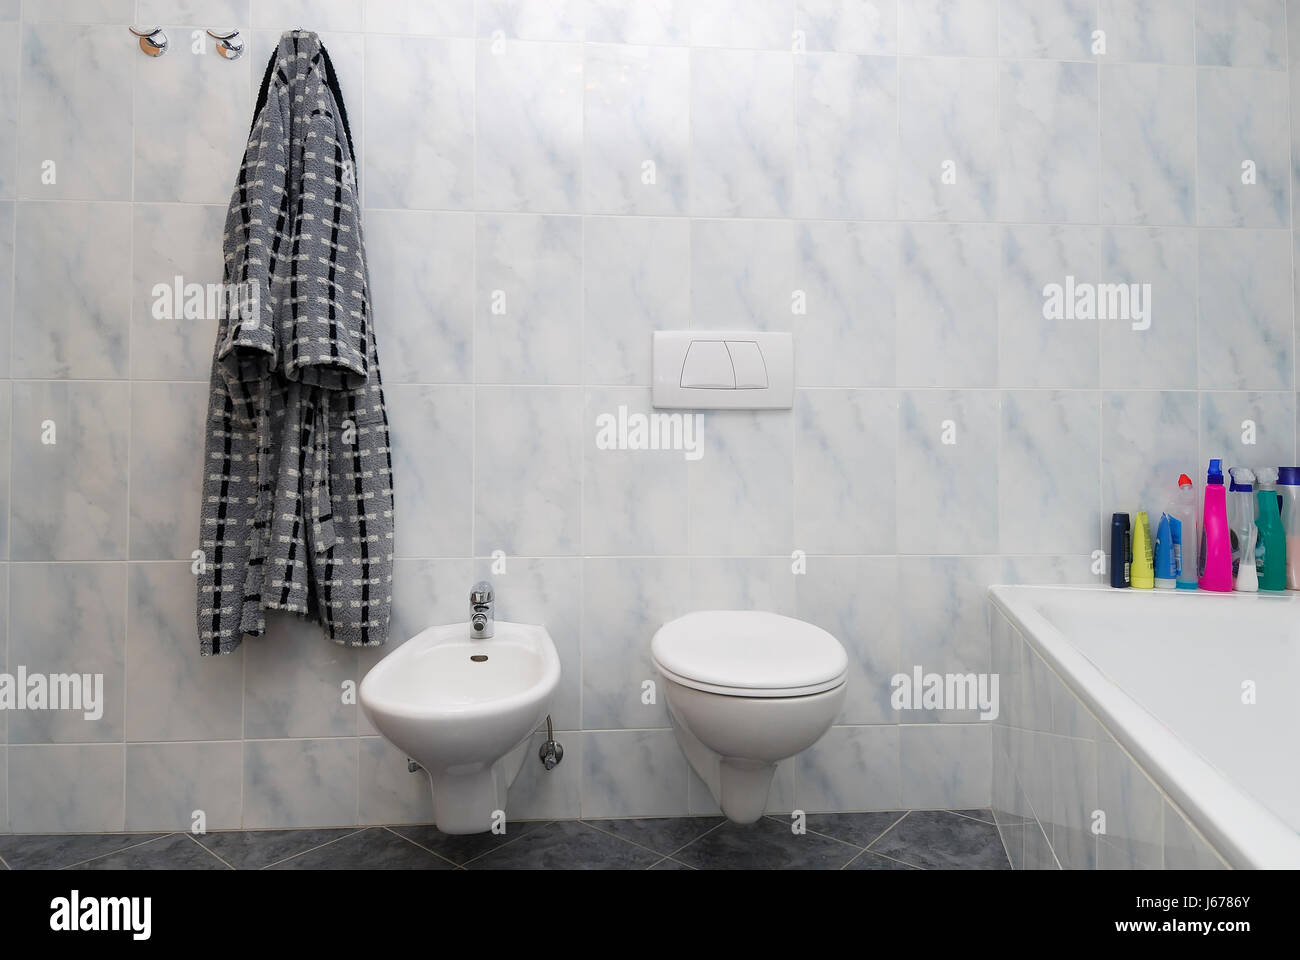 flow ceramic tiles toilet washroom bidet bathroom flow ceramic tiles bathrobe Stock Photo